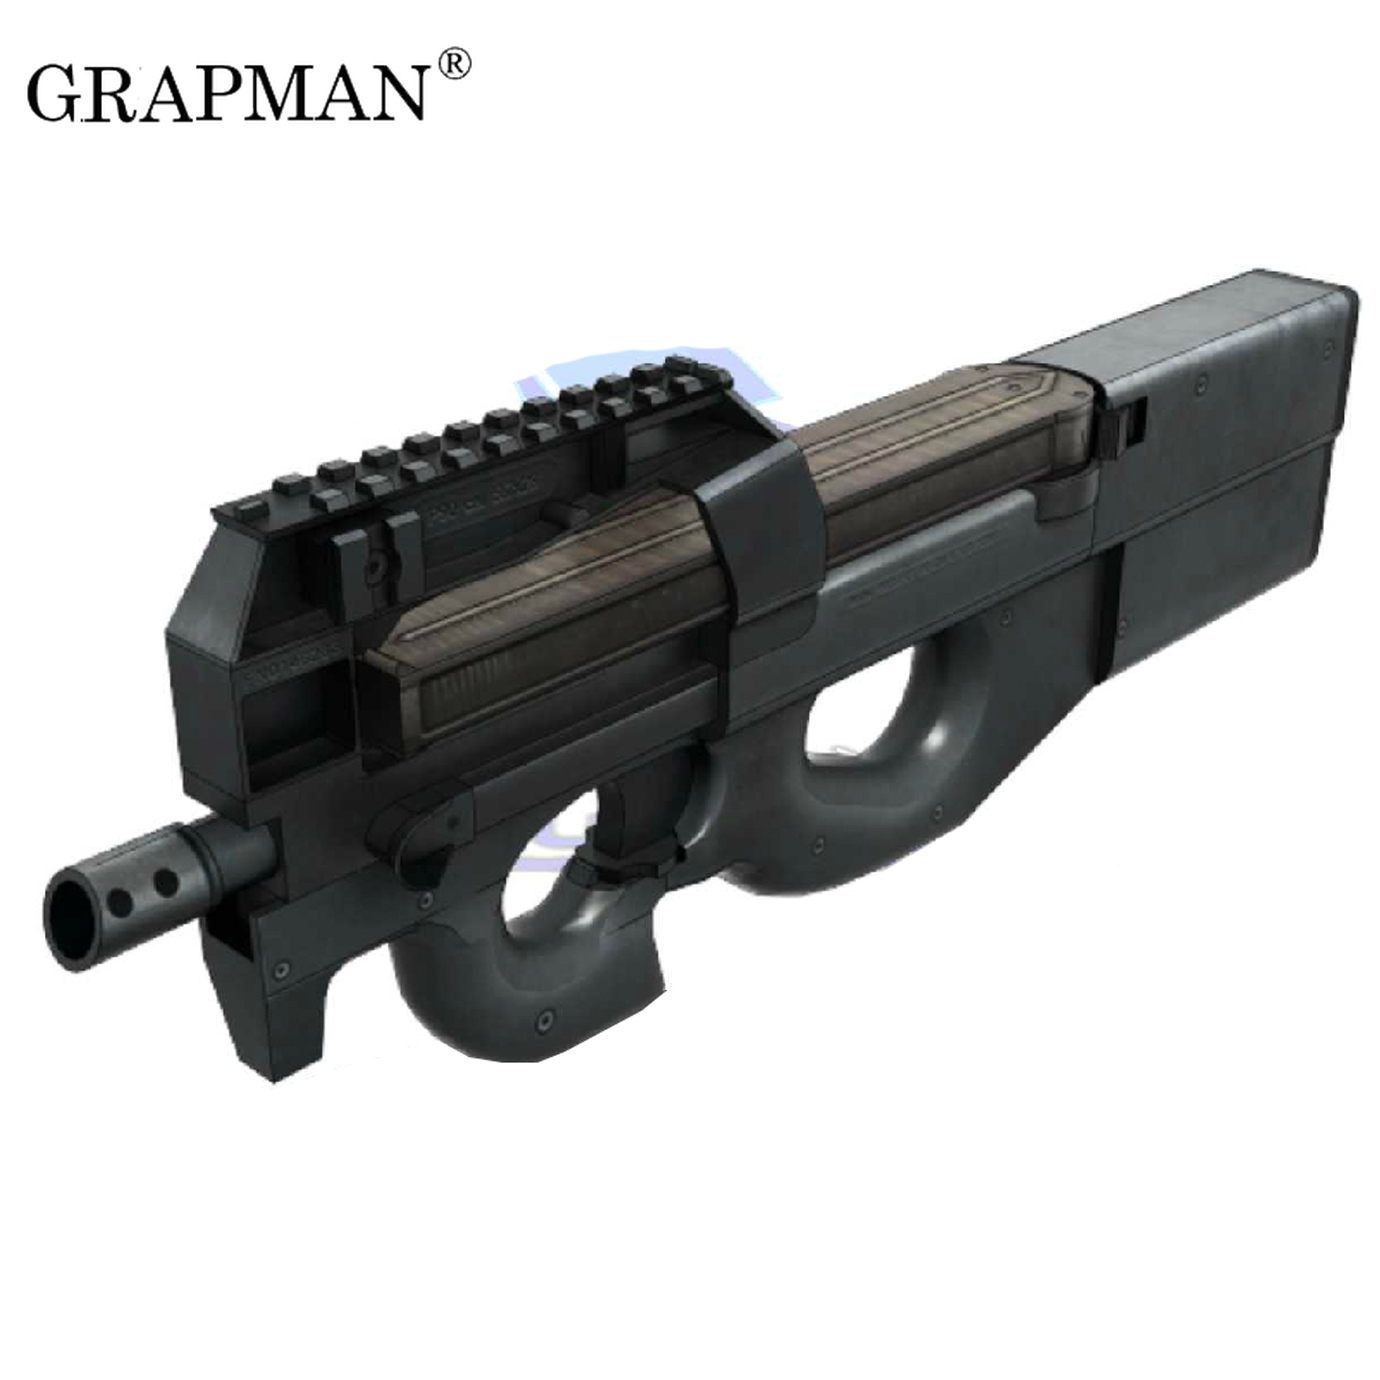 Paper Model Gun Modern Fn P90 Submachinegun 1:1 Proportion 3D Puzzle DIY Paper Model Educational Toy